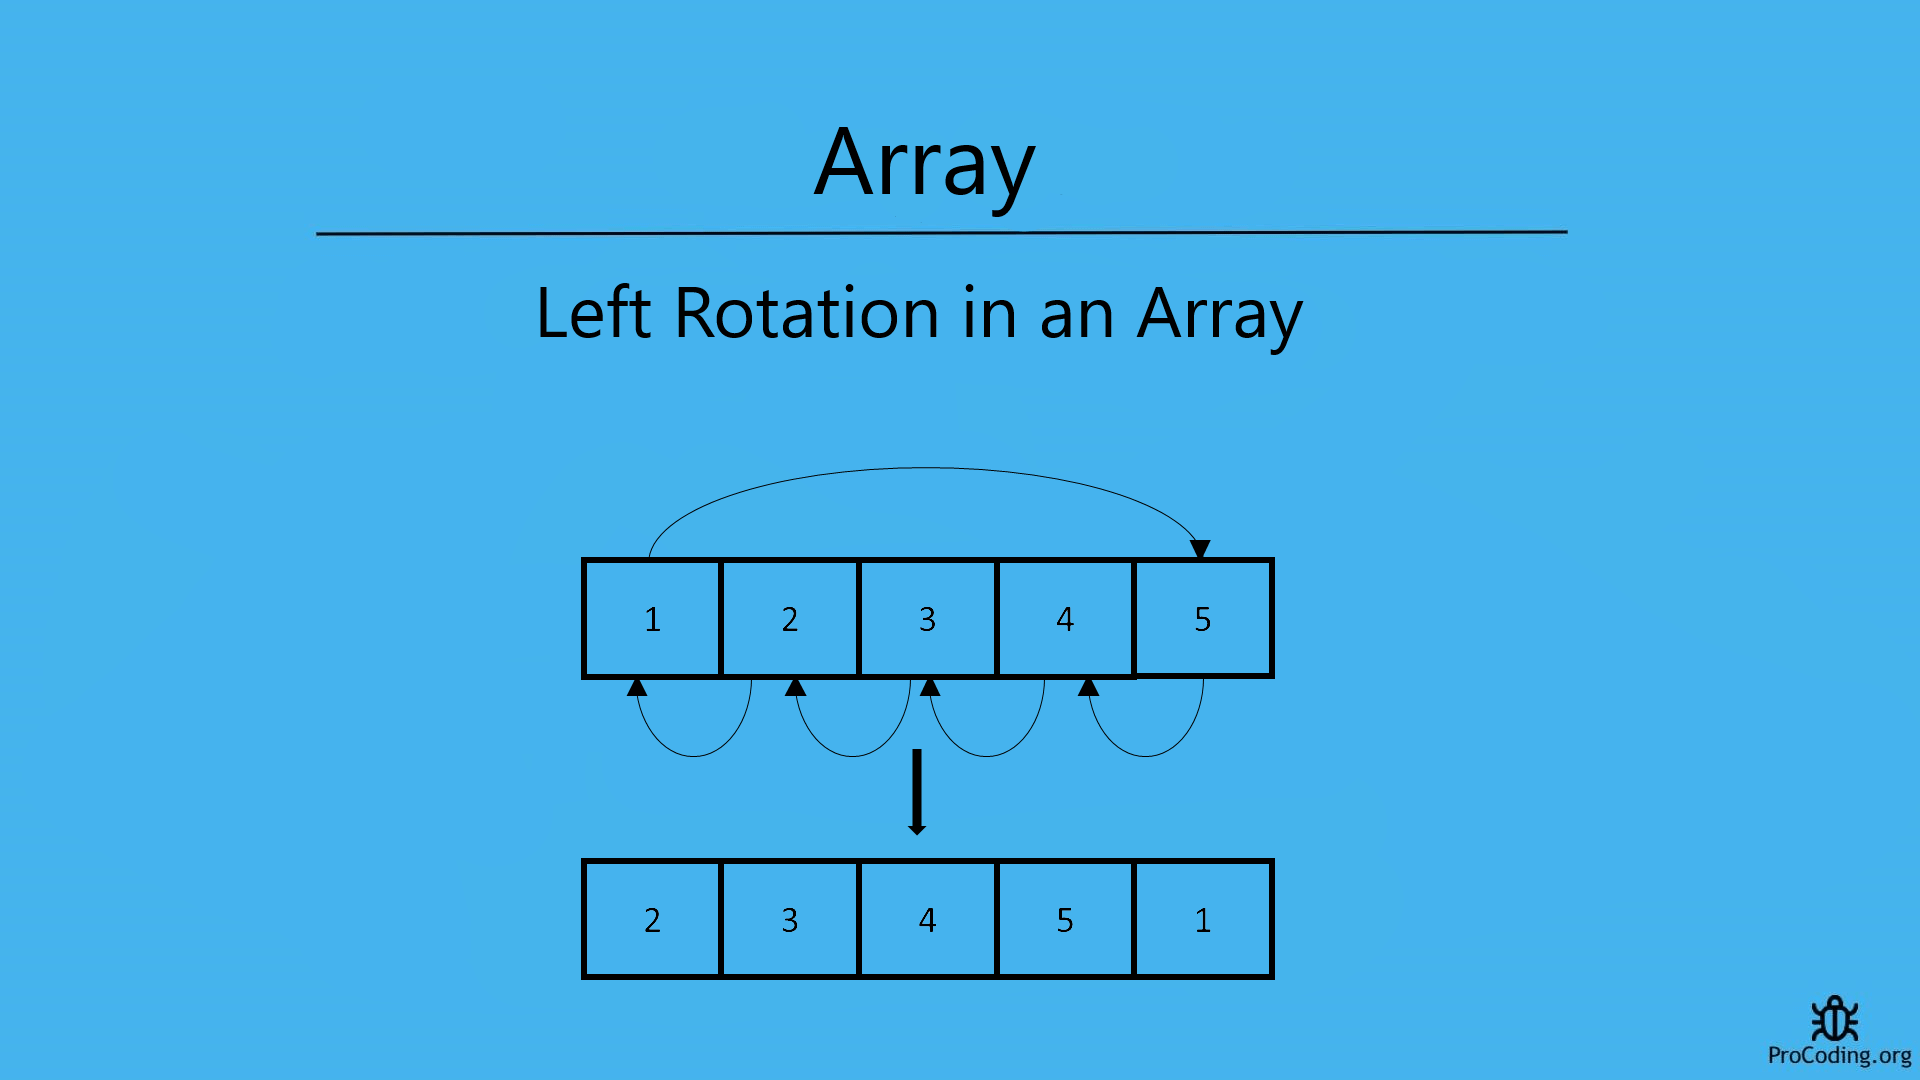 Left rotation in an array